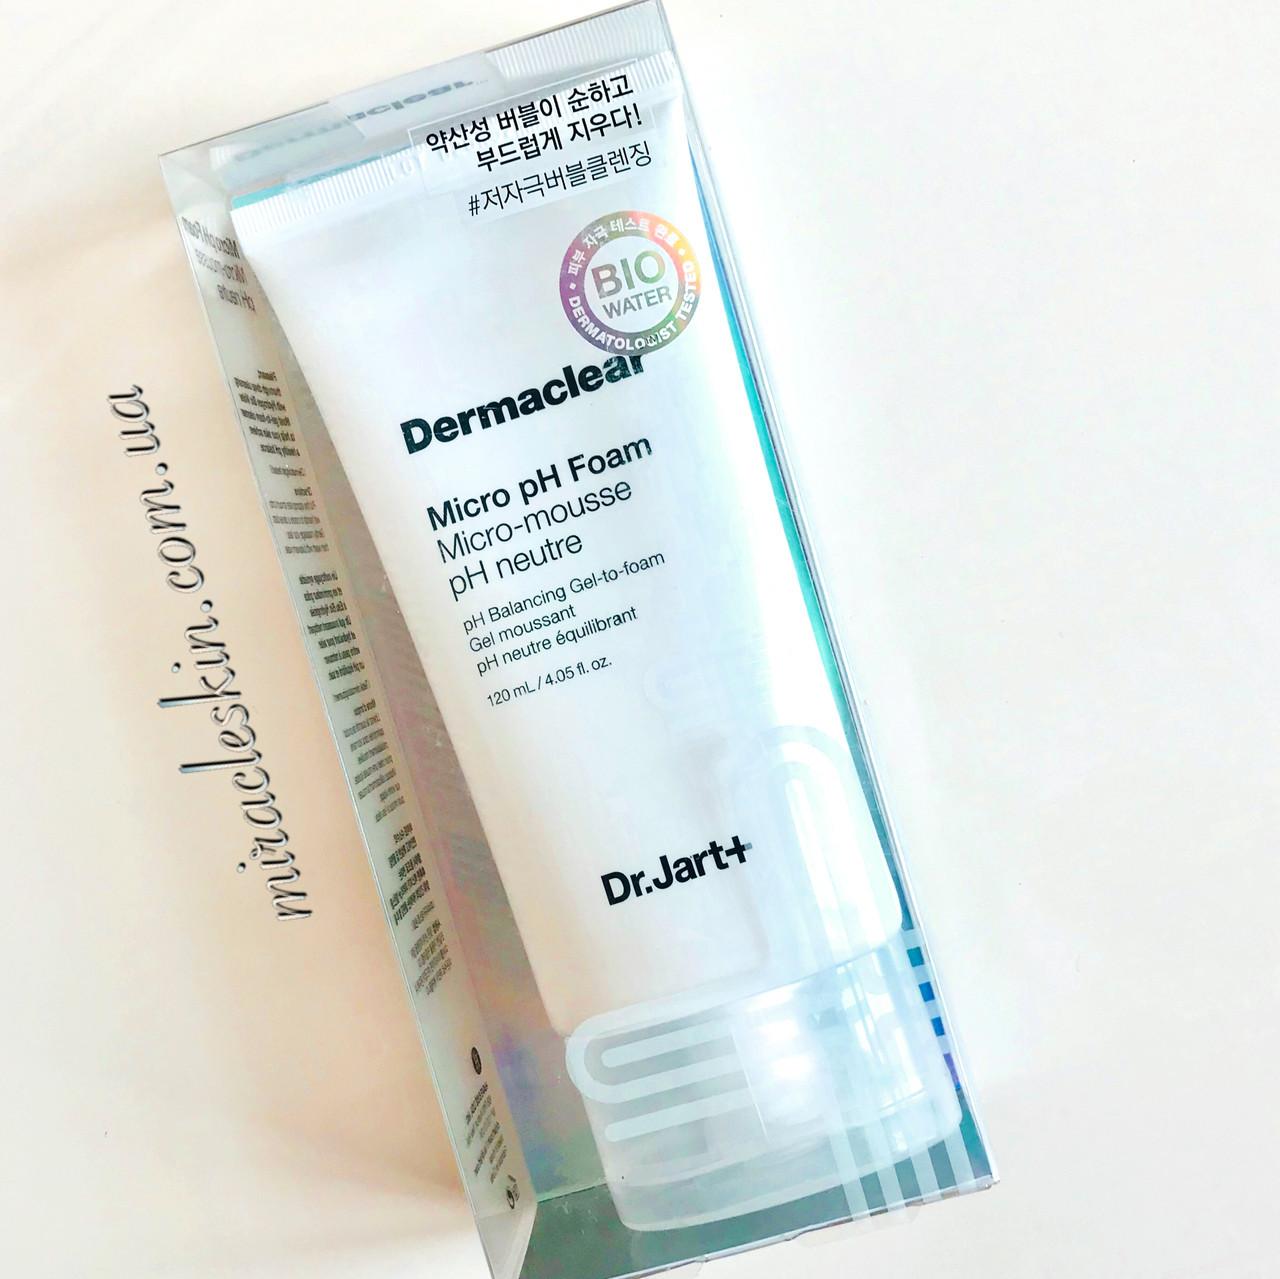 Dr.Jart Dermaclear Micro pH Foam Micro-mousse pH neutre, 120ml  Очищающая пенка с нейтральным рН